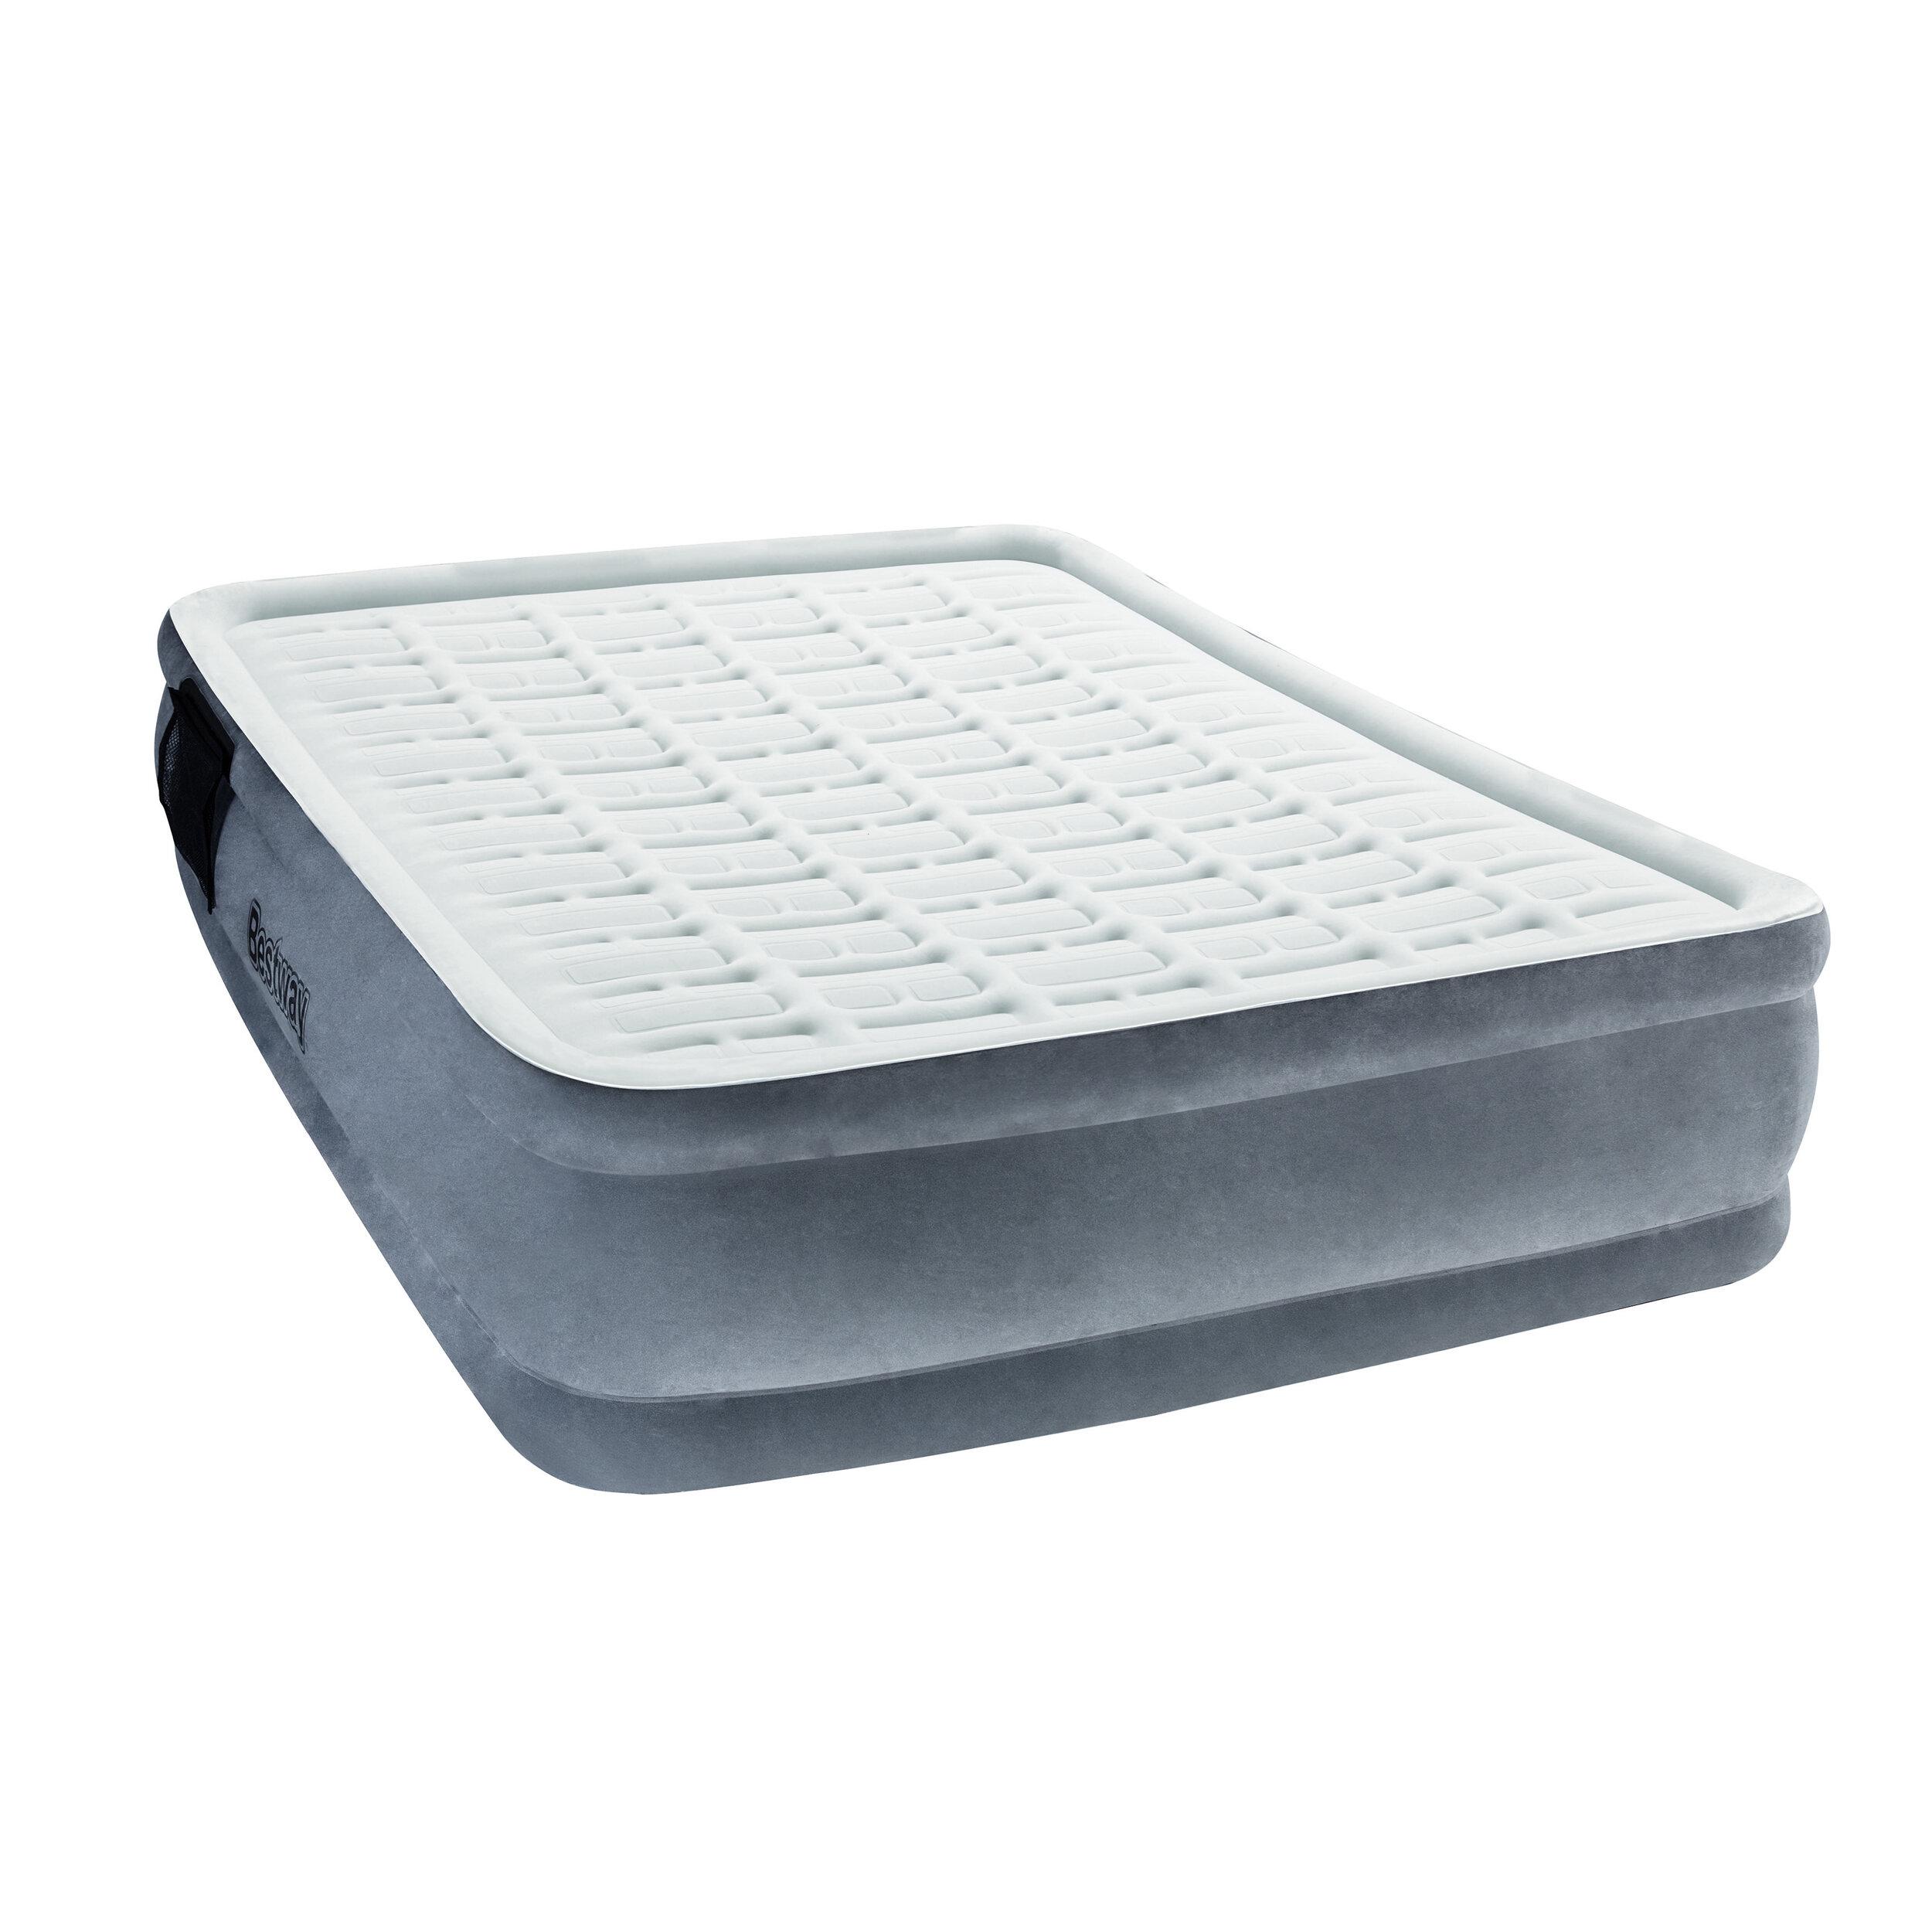 wayfair mattress image air pdp foam reviews memory sharper ca mattresses